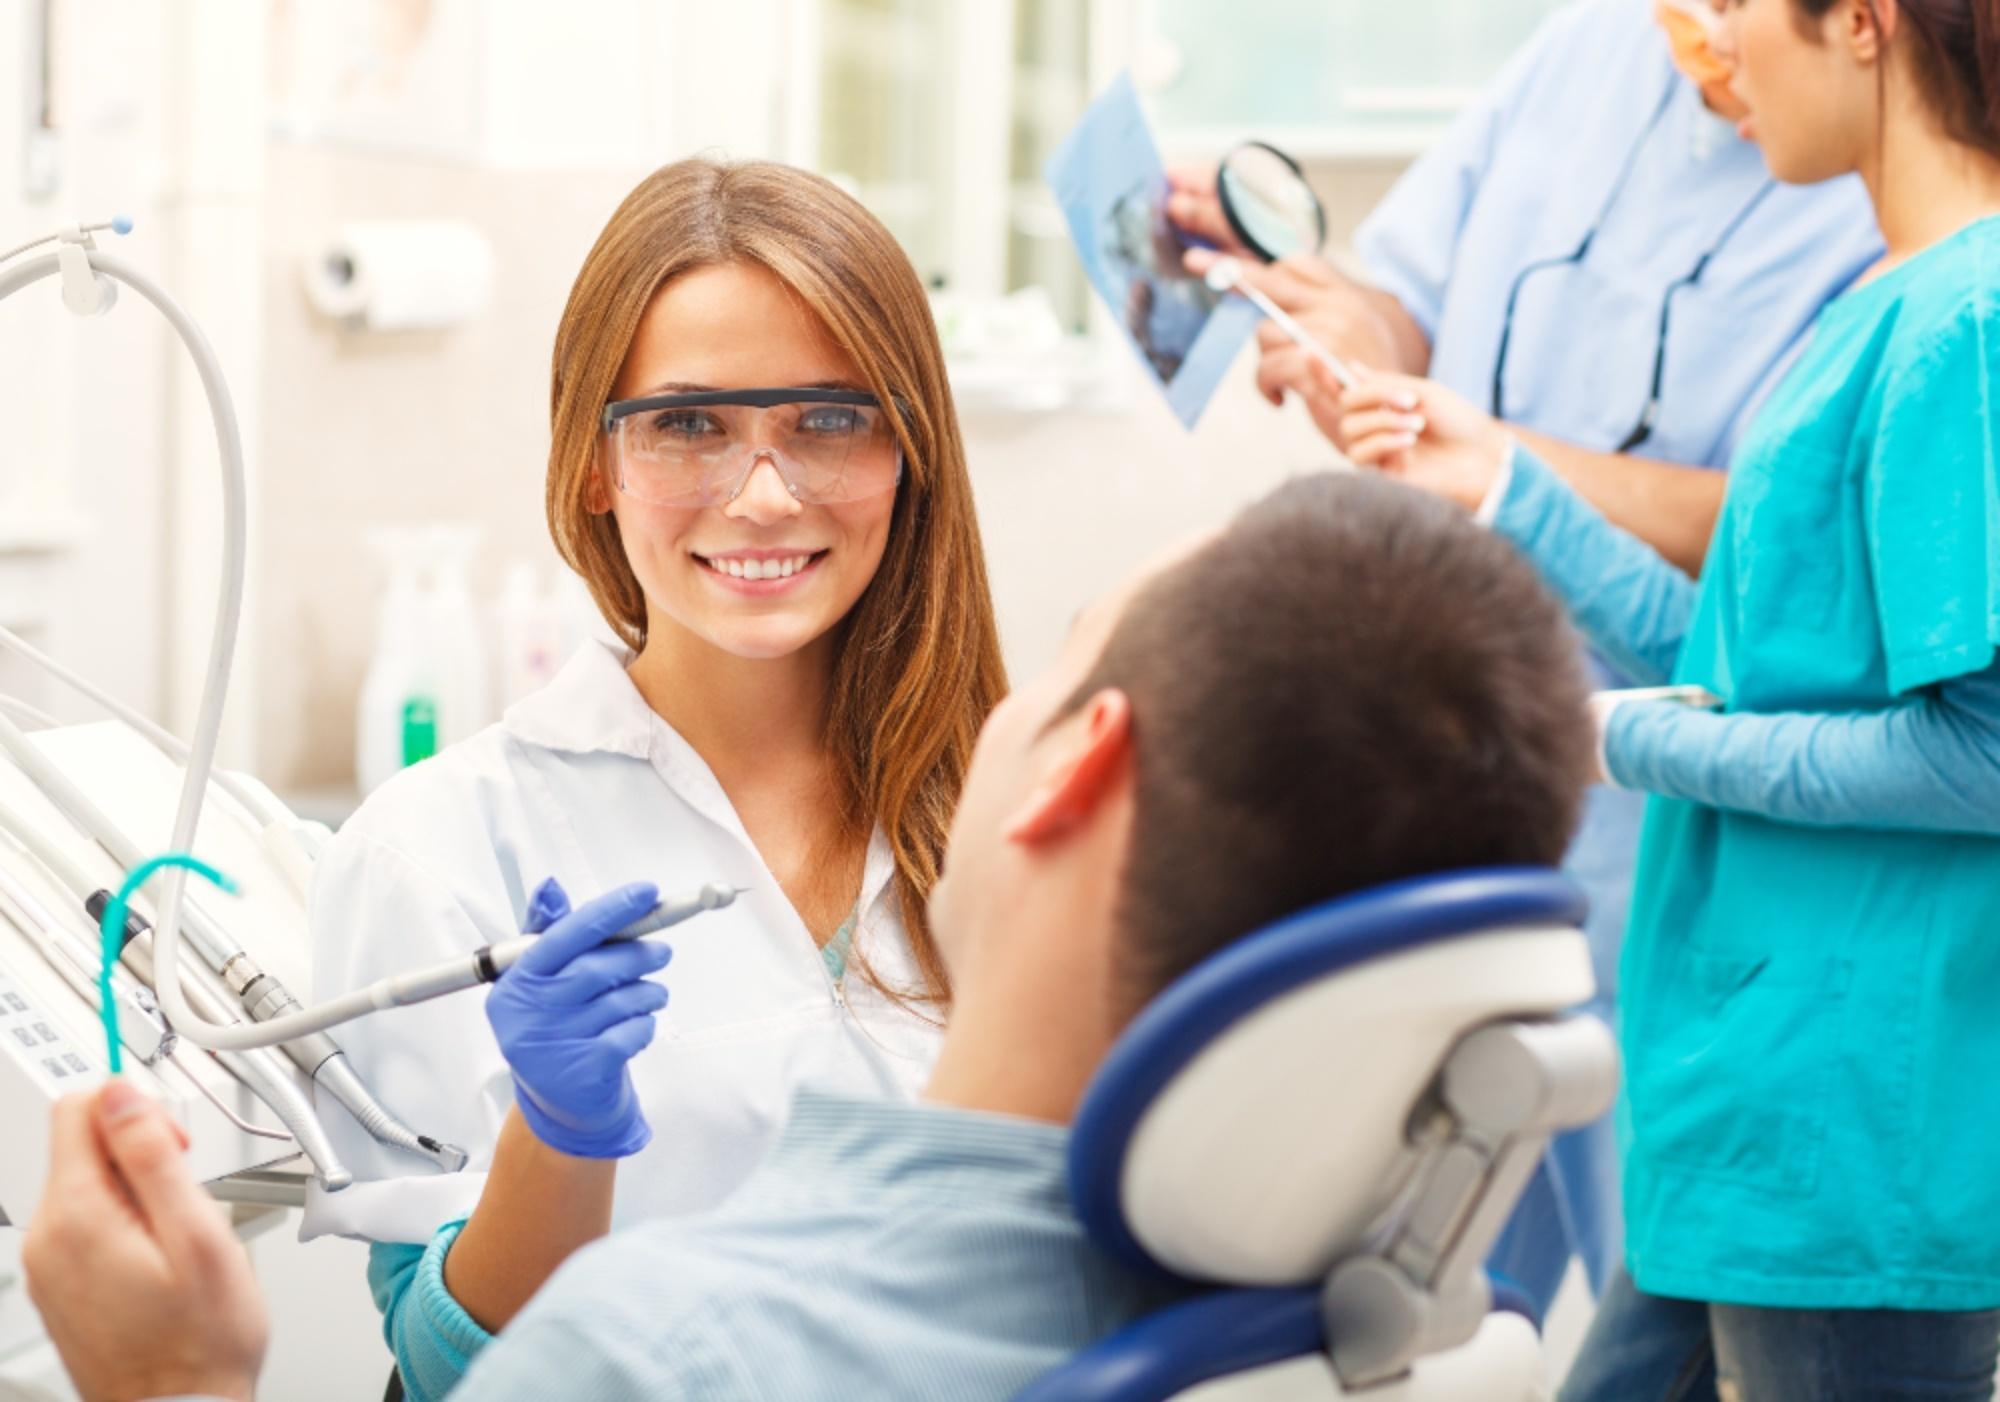 dentist at work-1